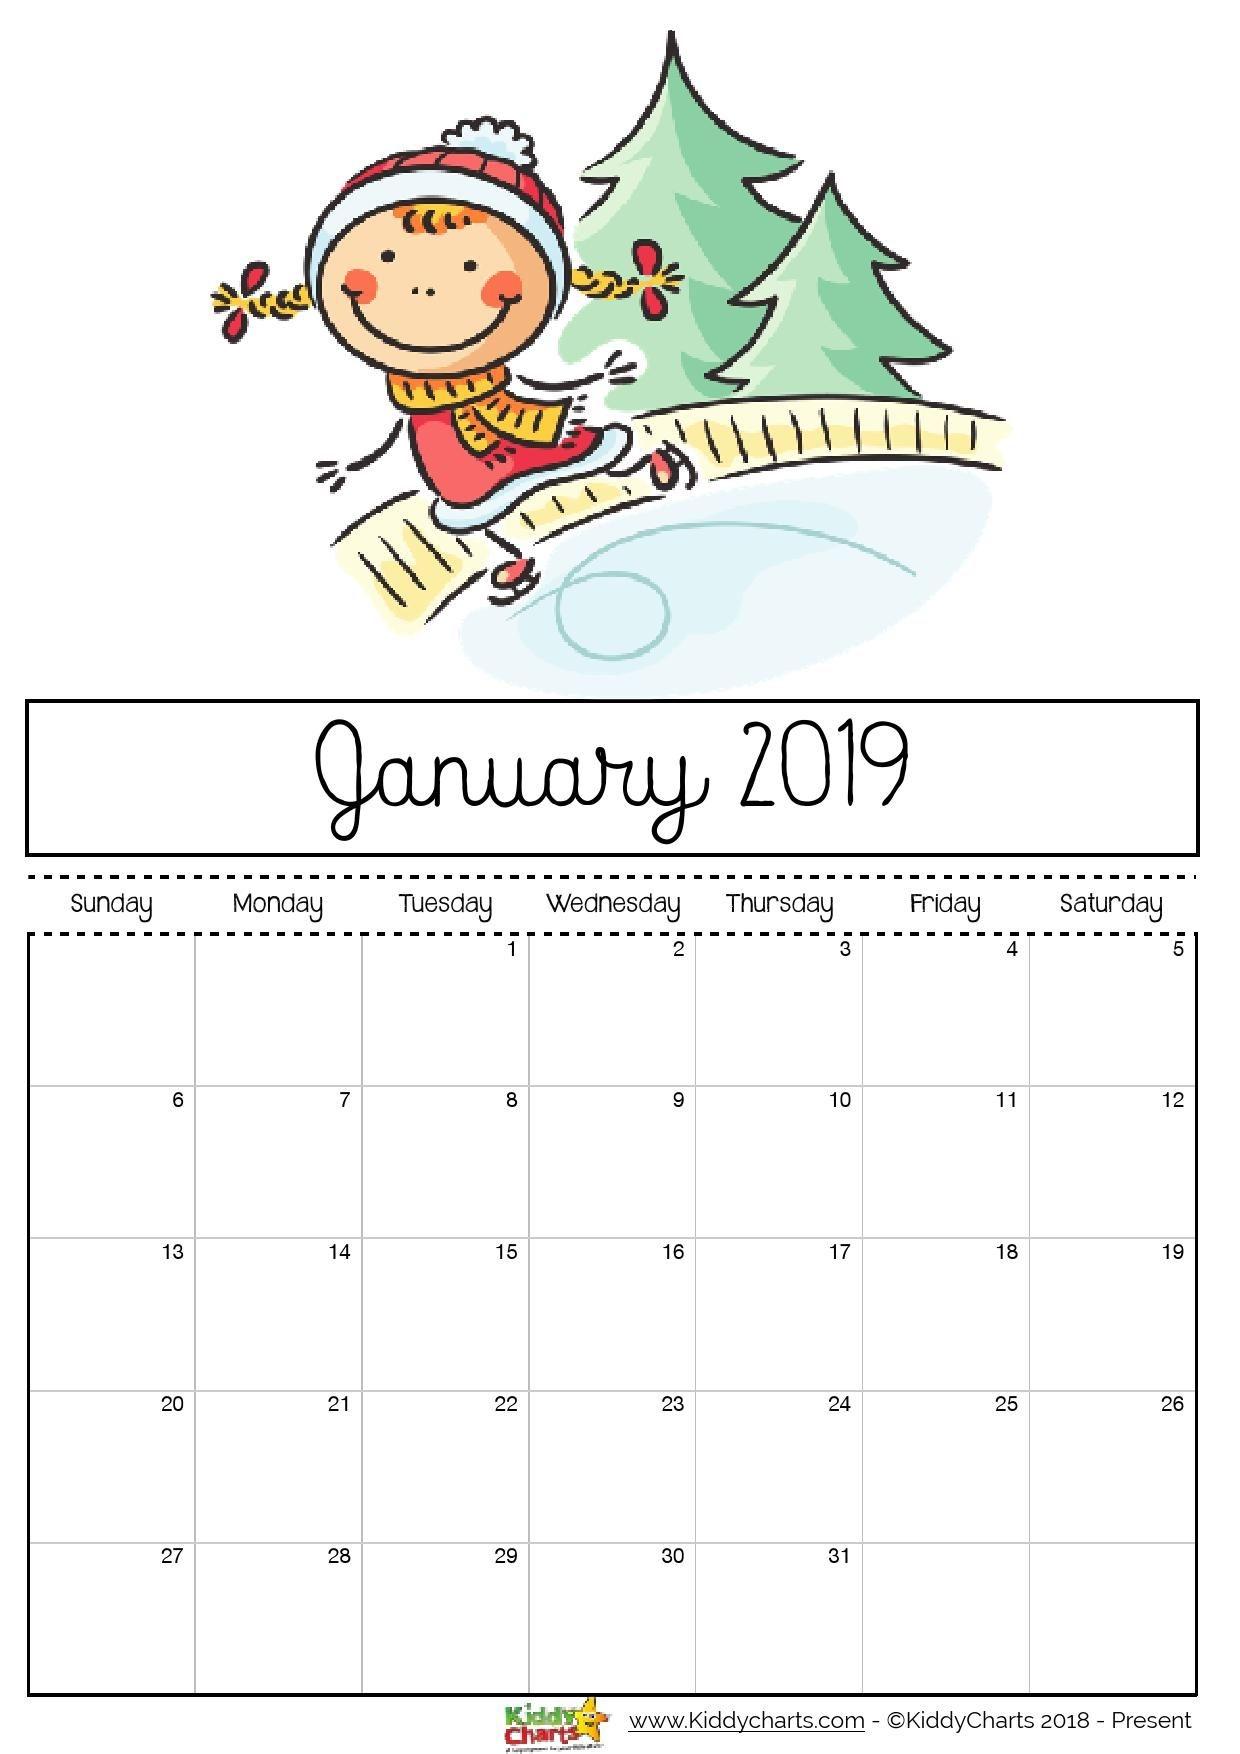 printable kids calendar 2019